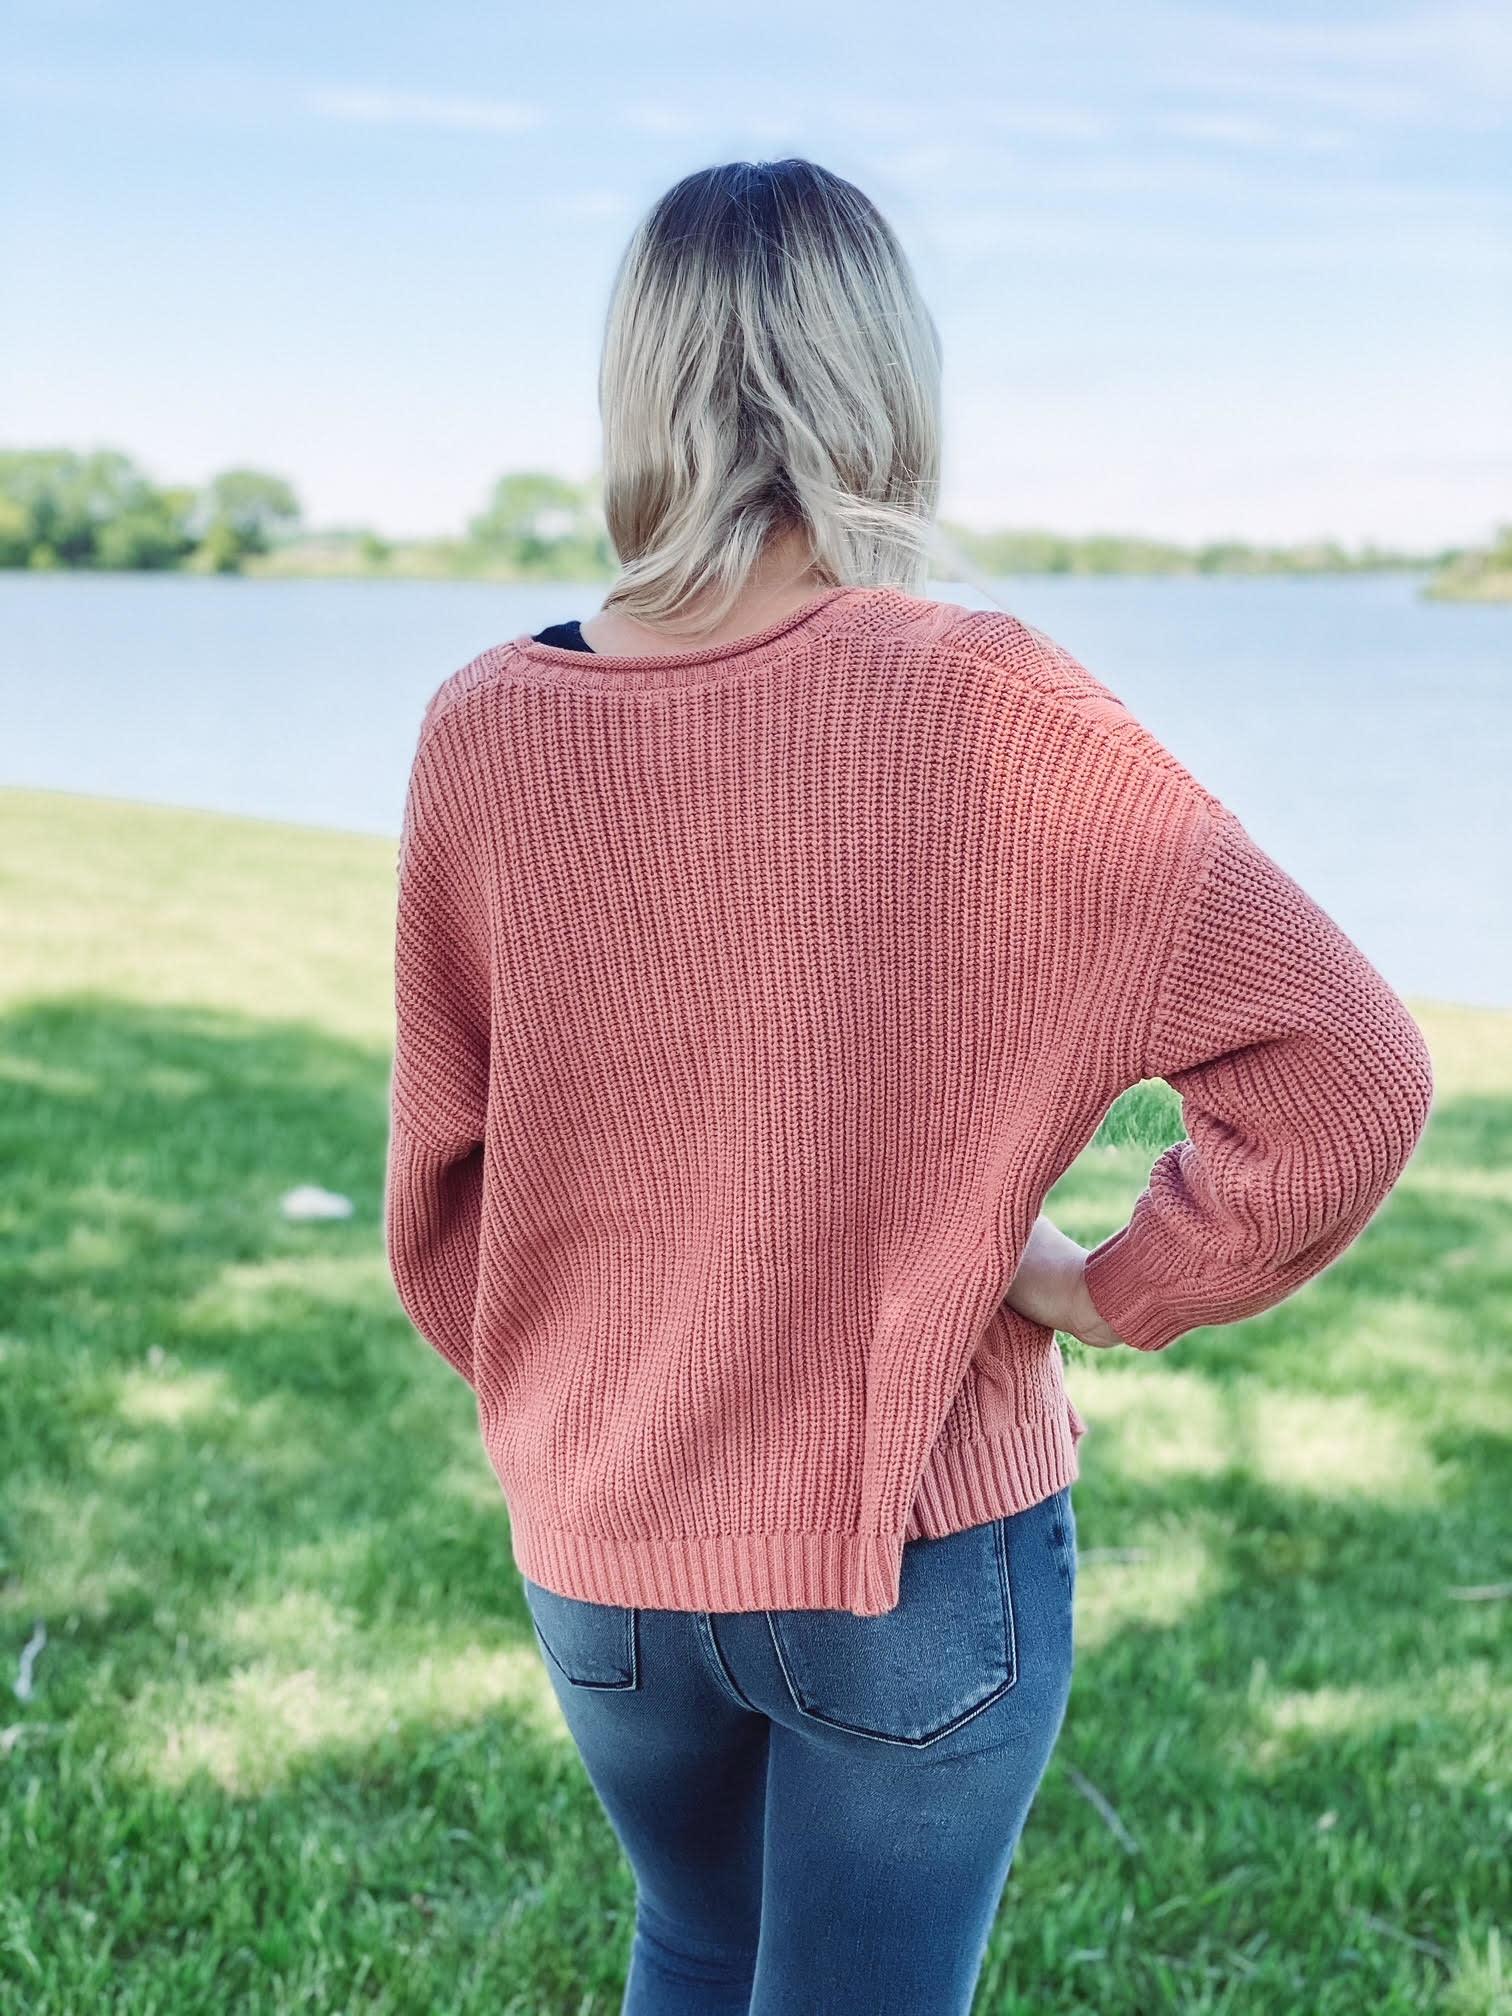 Cora Copper Knit Cardigan